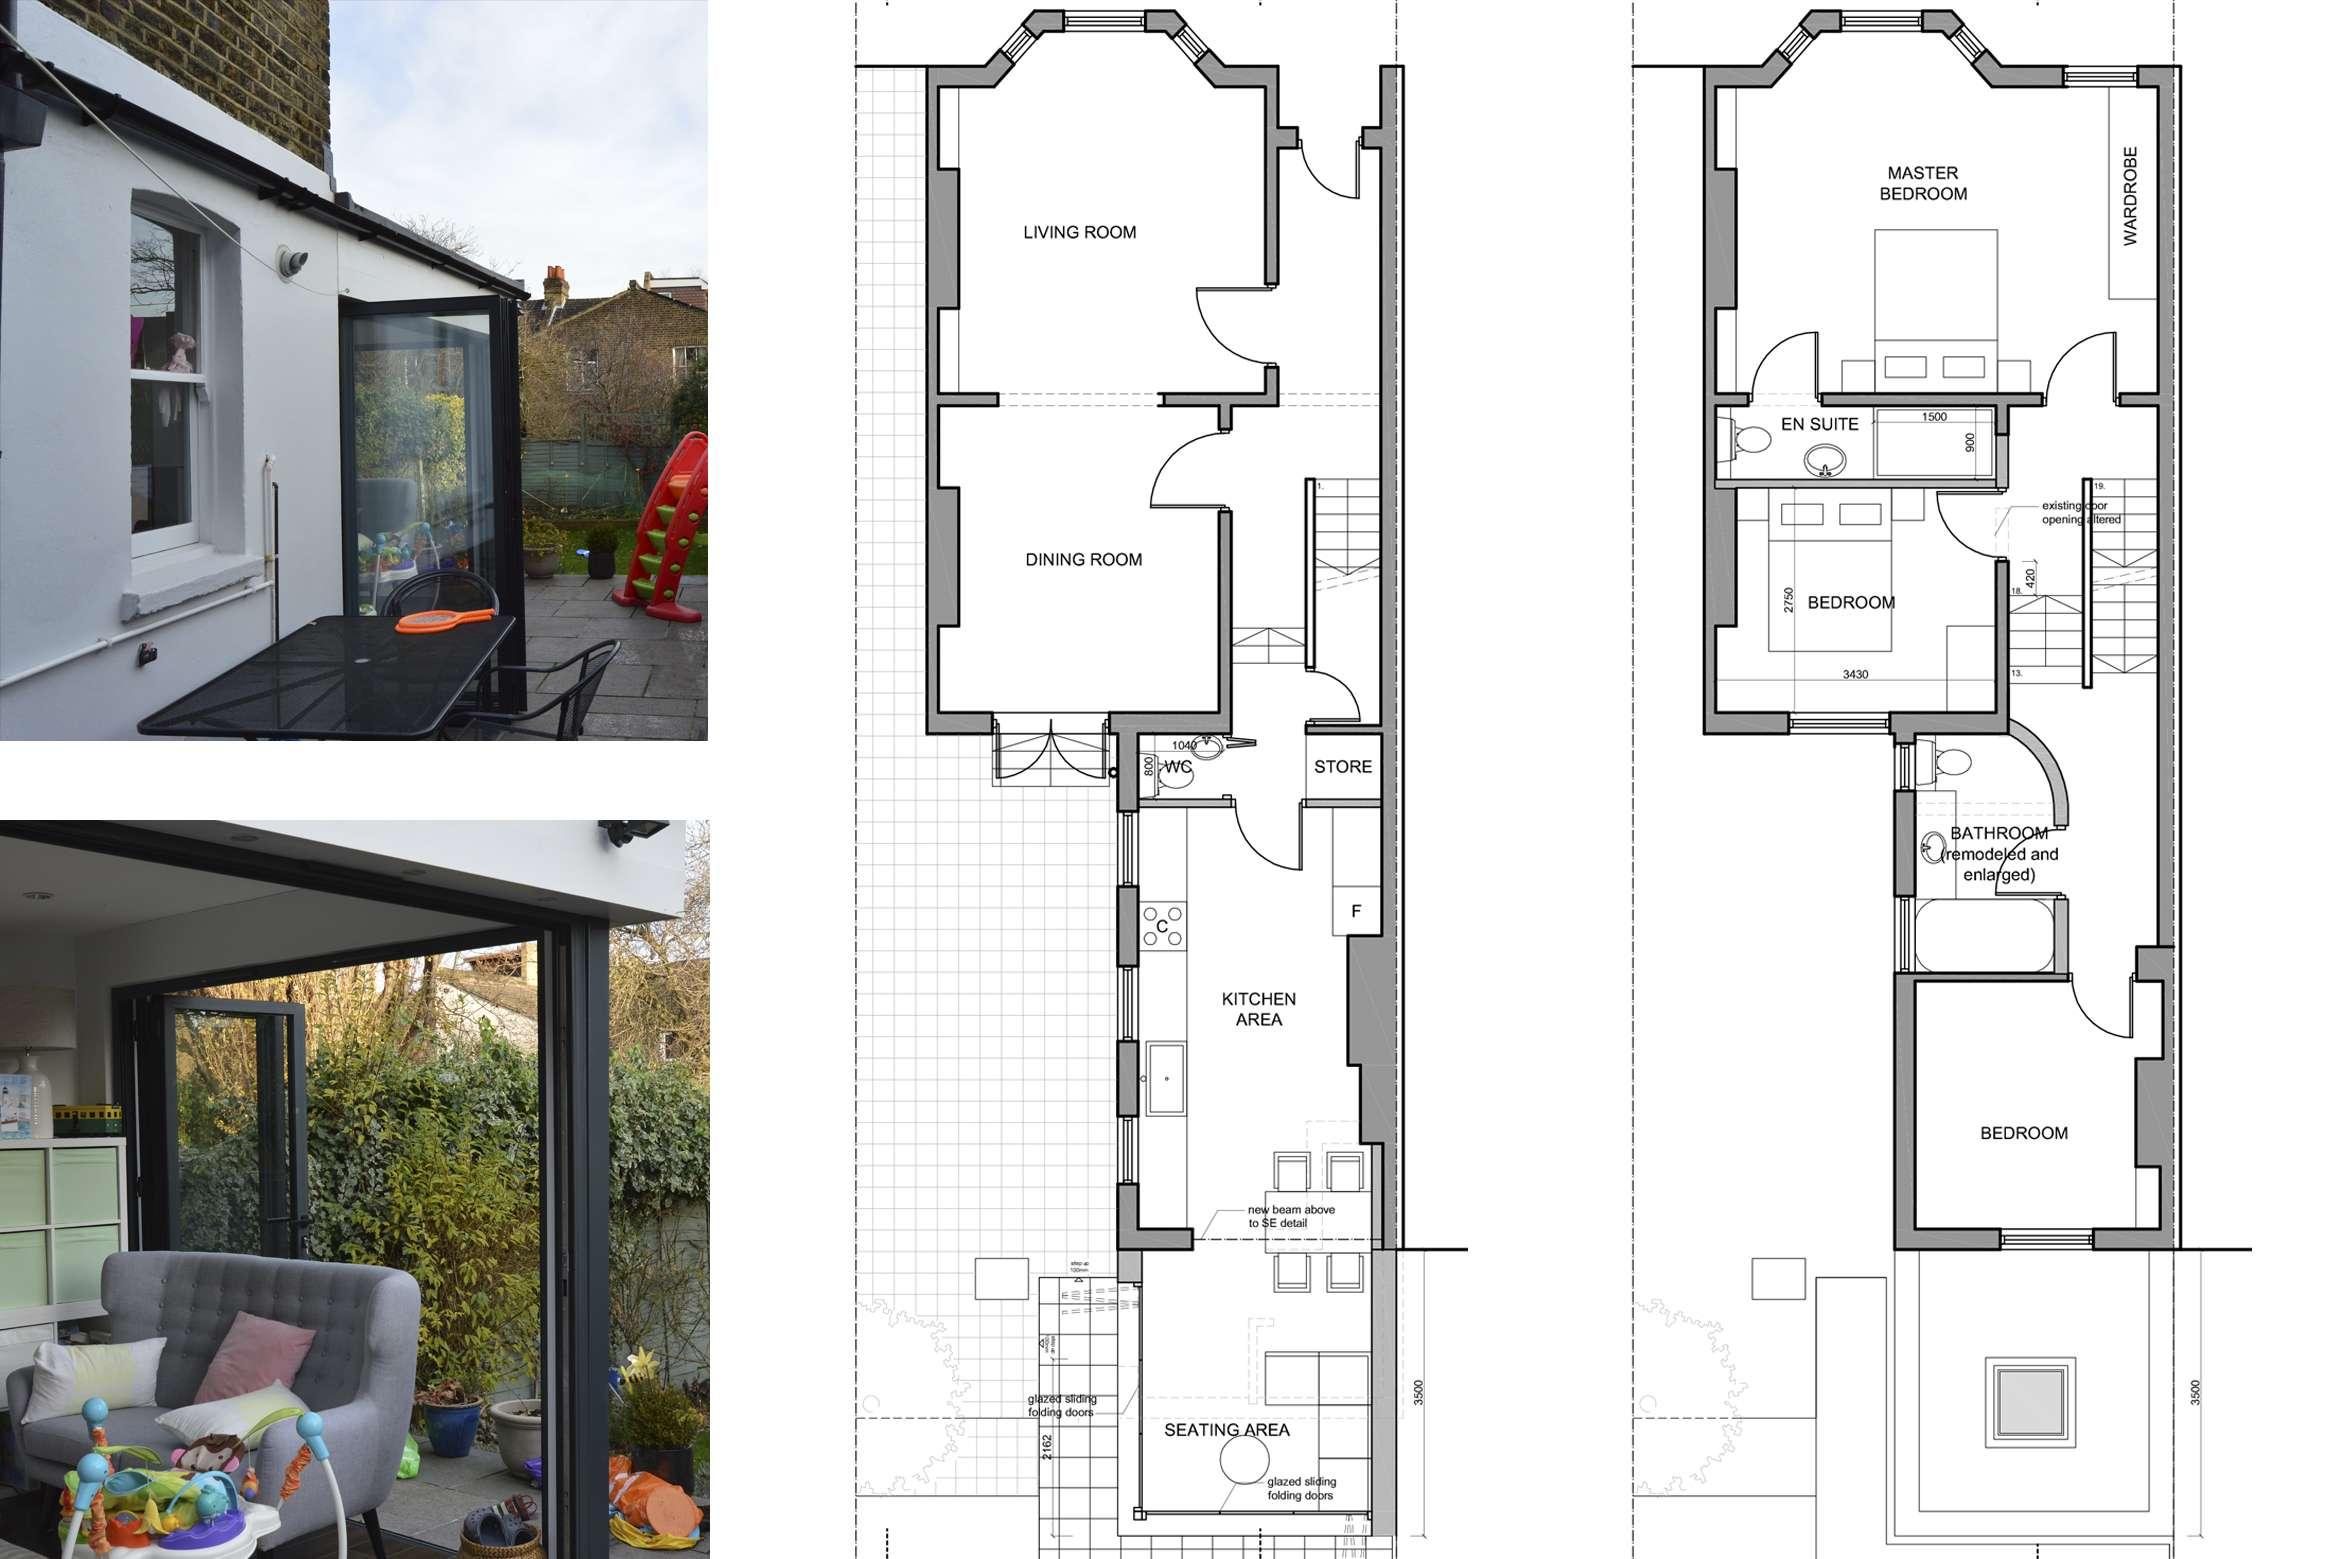 Architect designed rear house extension Penge east Bromley SE26 Floor plan drawings Penge East, Bromley SE26 | Rear house extension